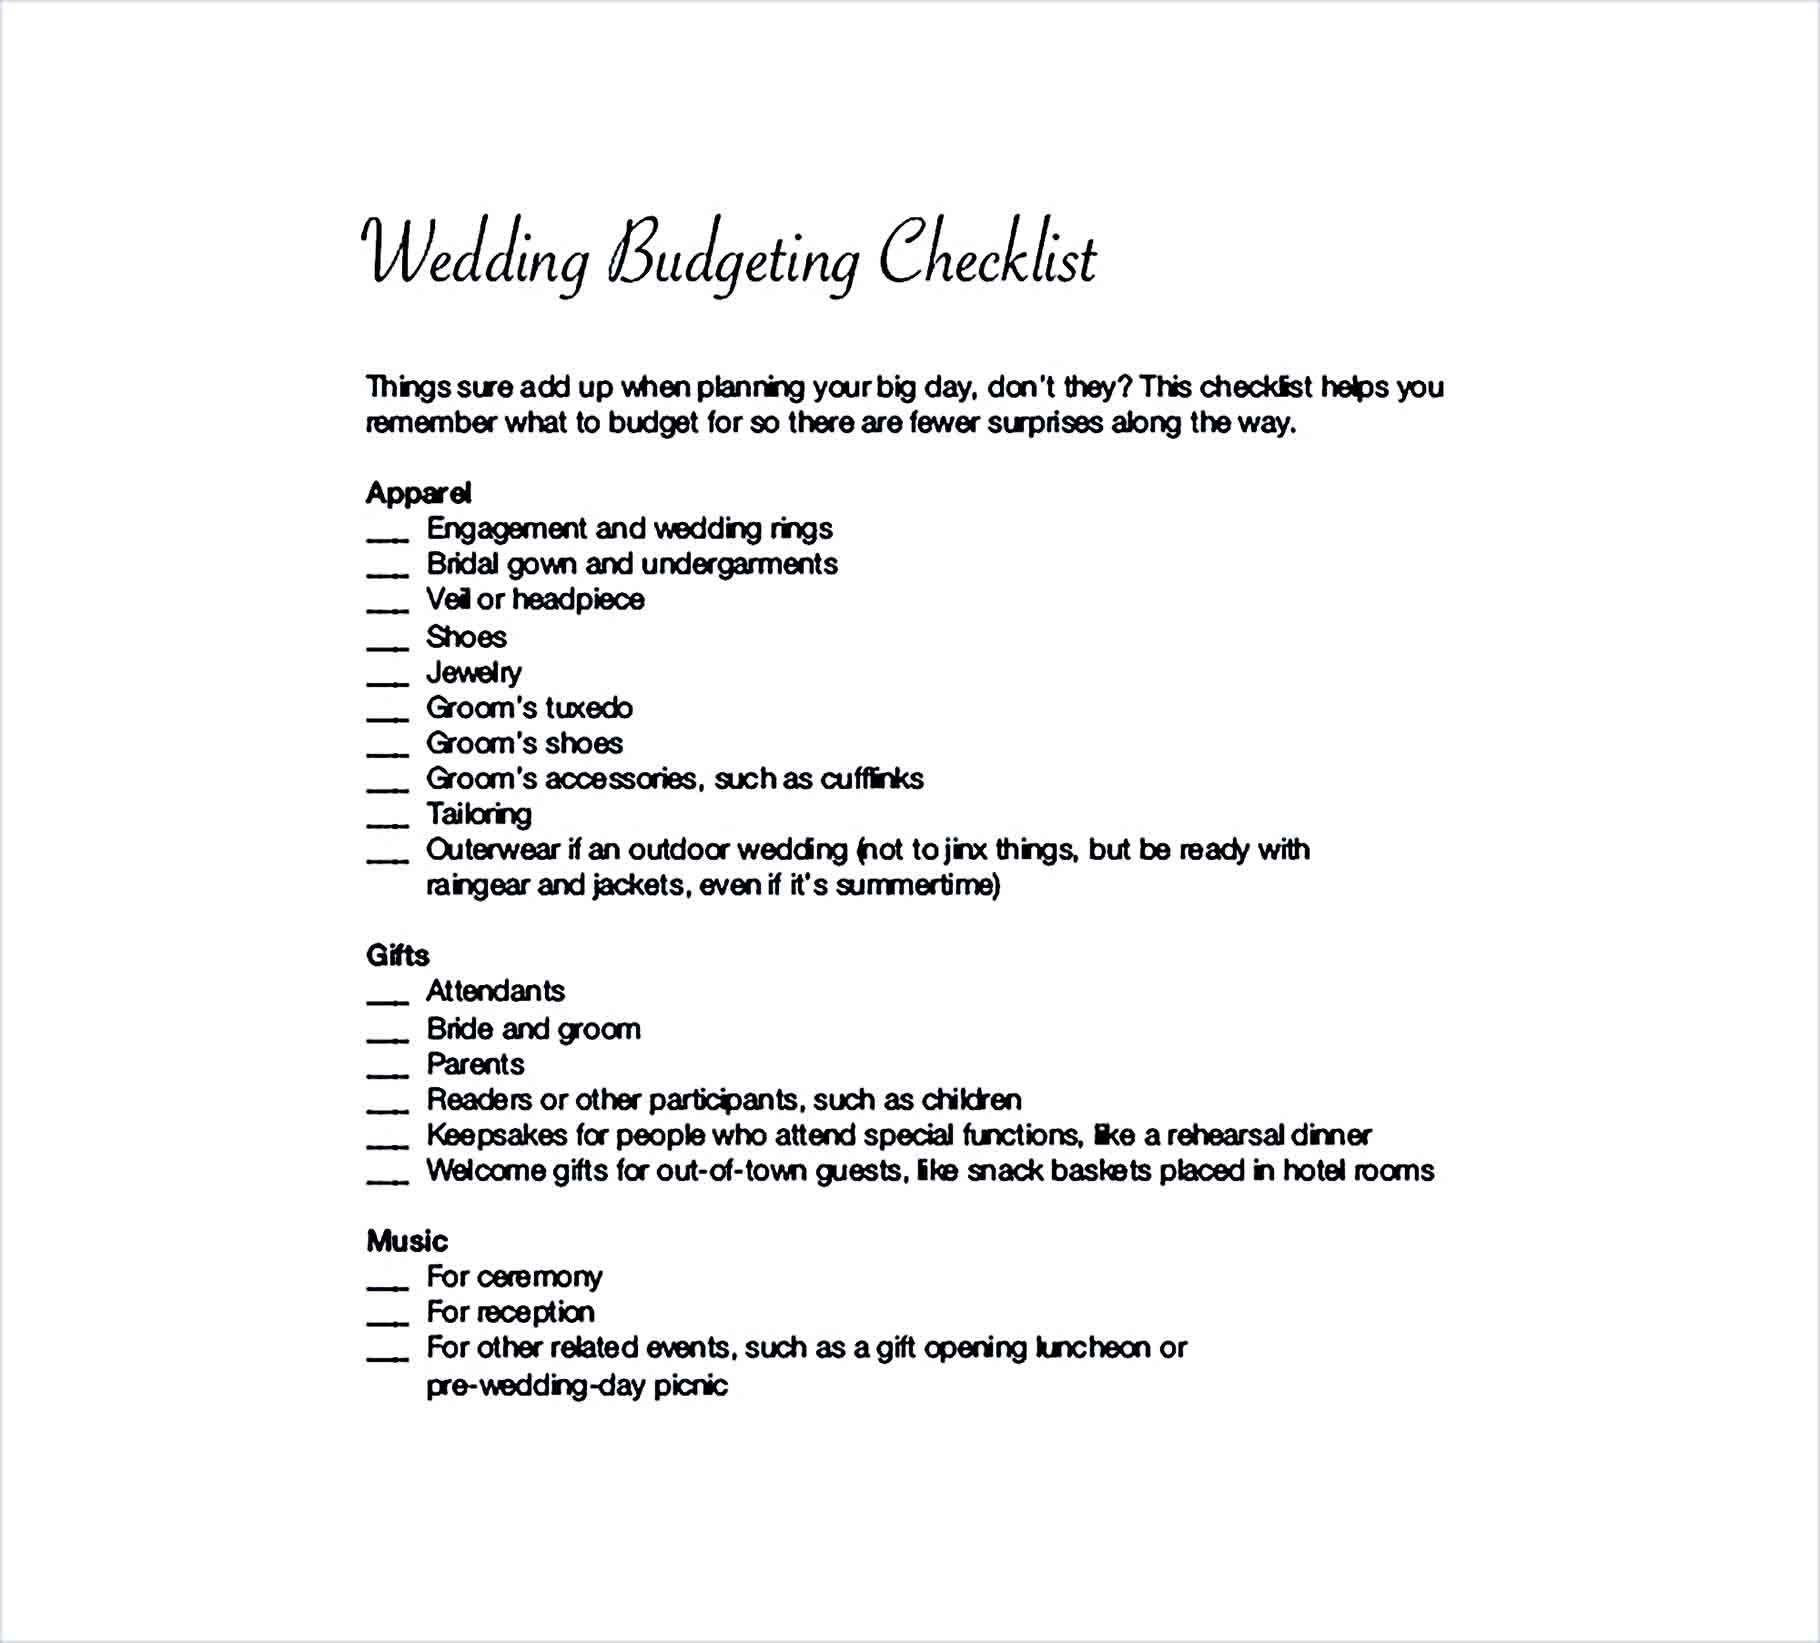 Sample Planed Wedding Budget Checklist